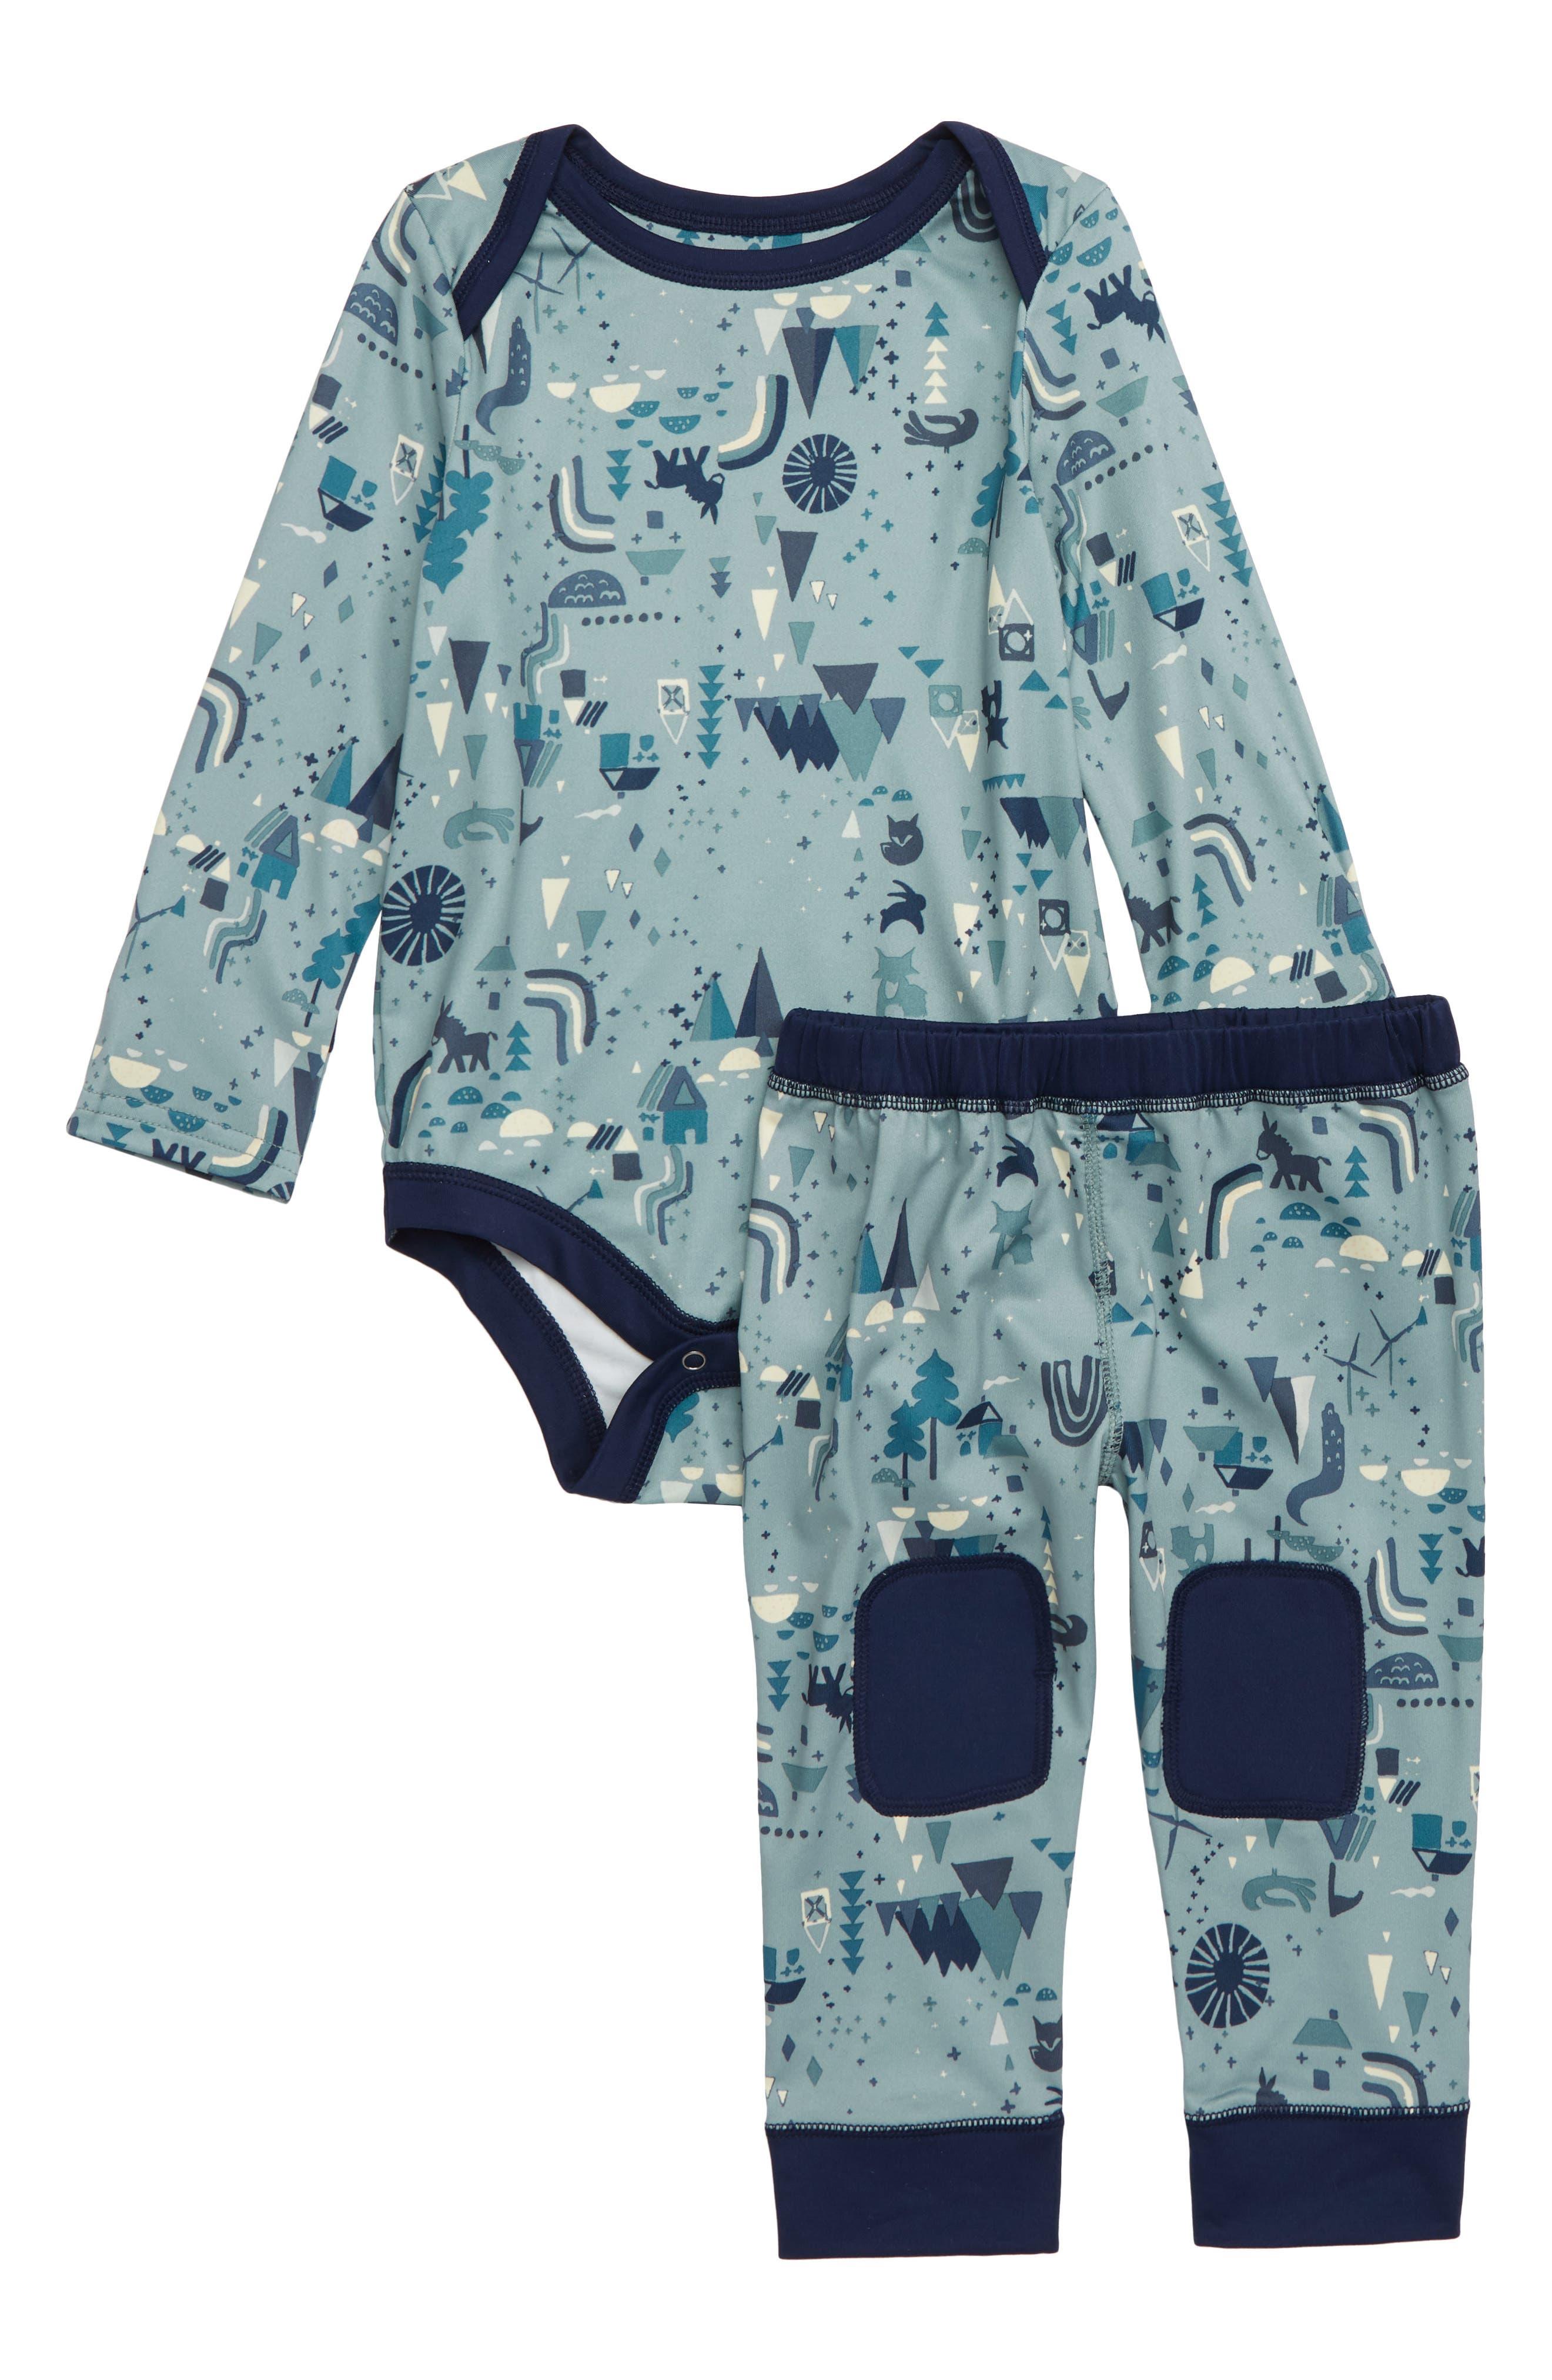 Capilene<sup>®</sup> Base Layer Bodysuit & Leggings,                         Main,                         color, BHCA BLACK HOUSE CADET BLUE